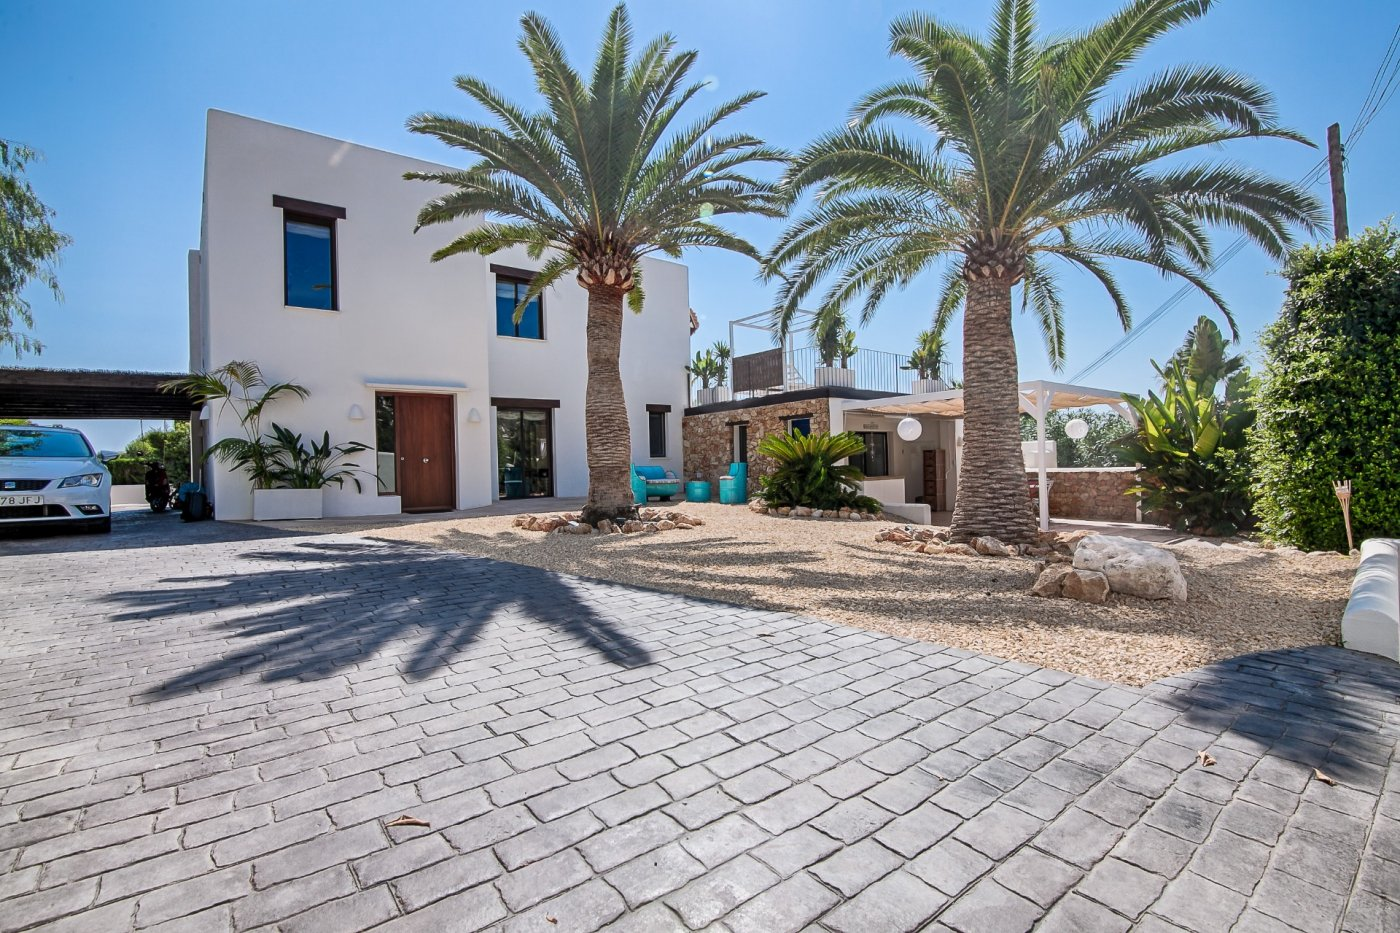 Villa - Ready To Move And Live - San Jaime - Benissa